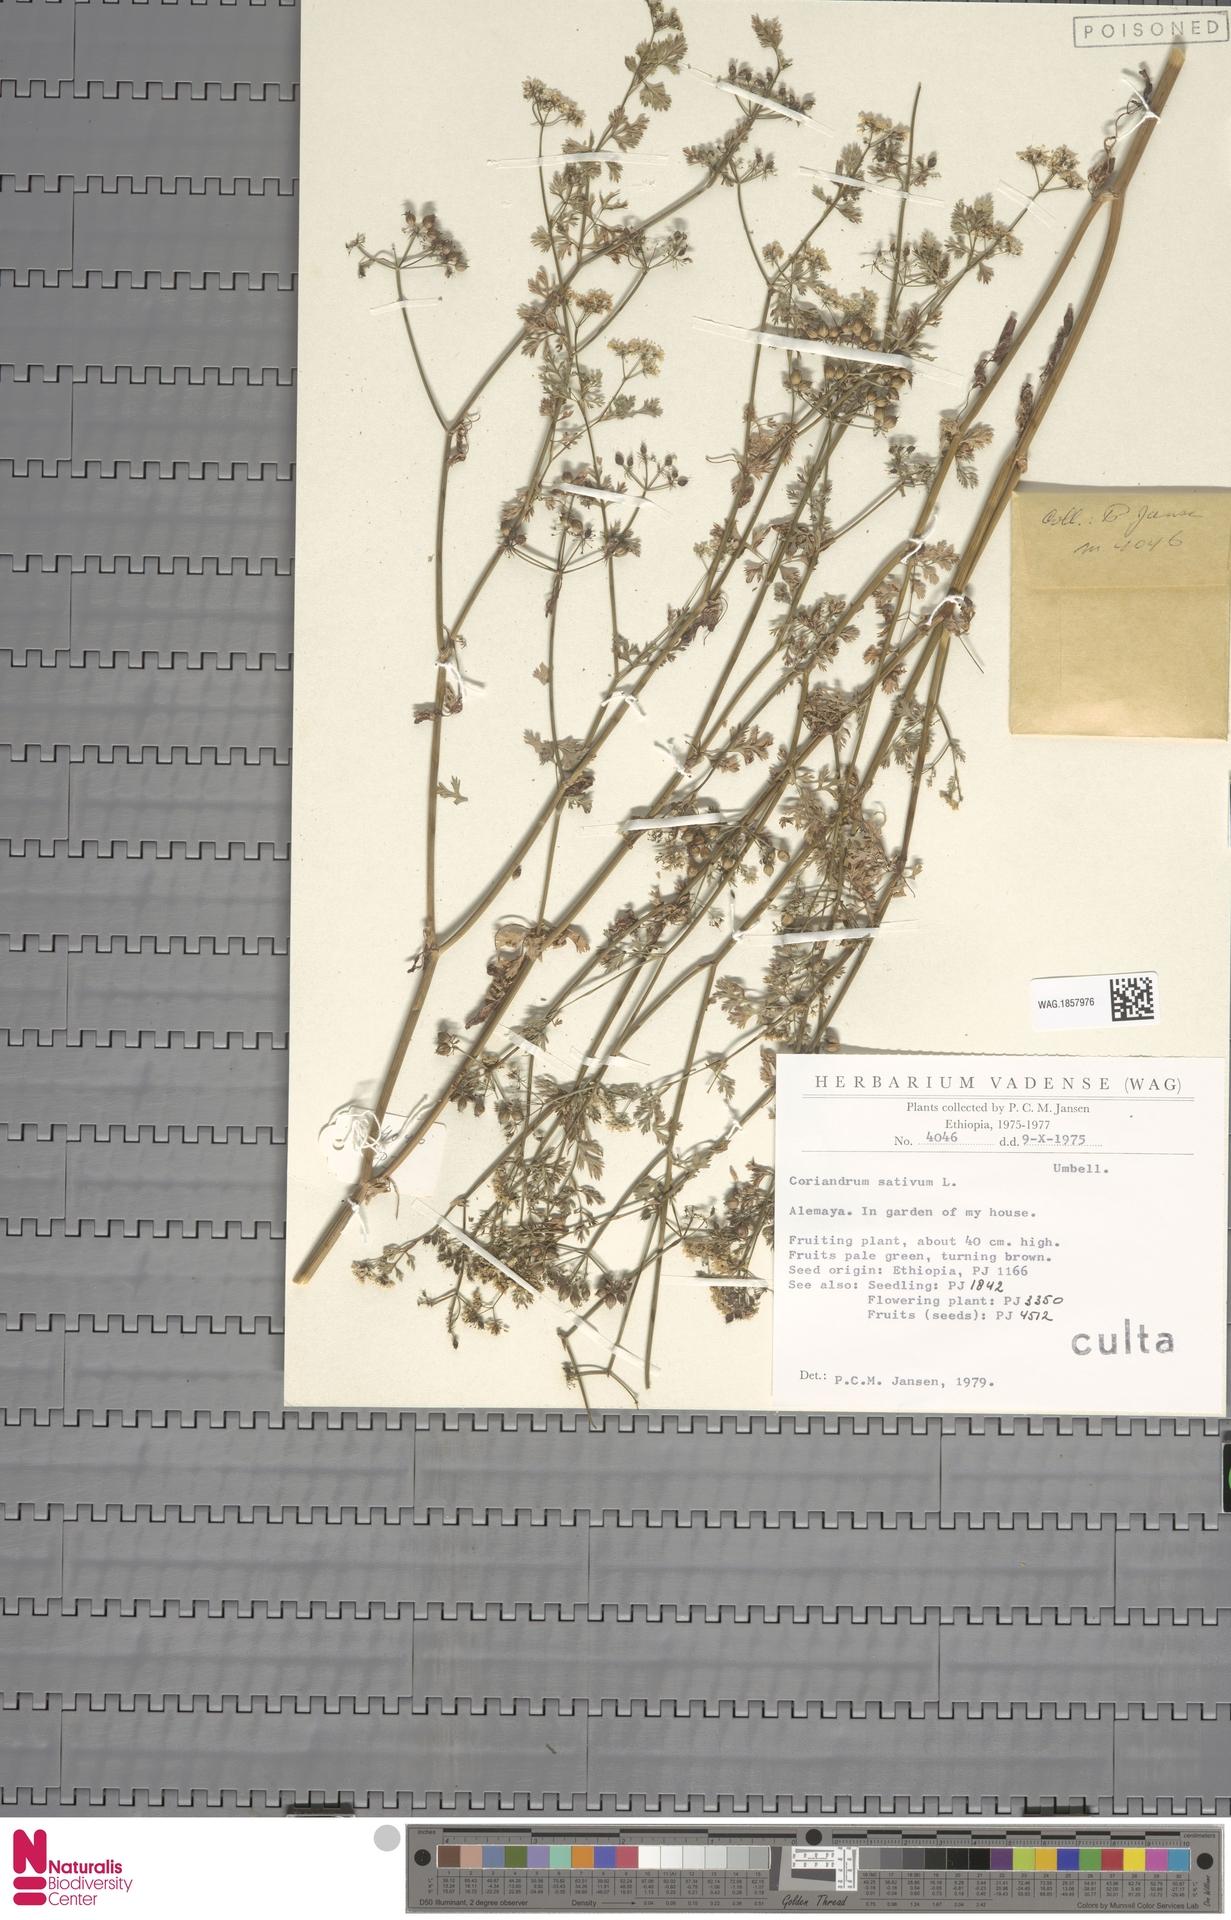 WAG.1857976   Coriandrum sativum L.